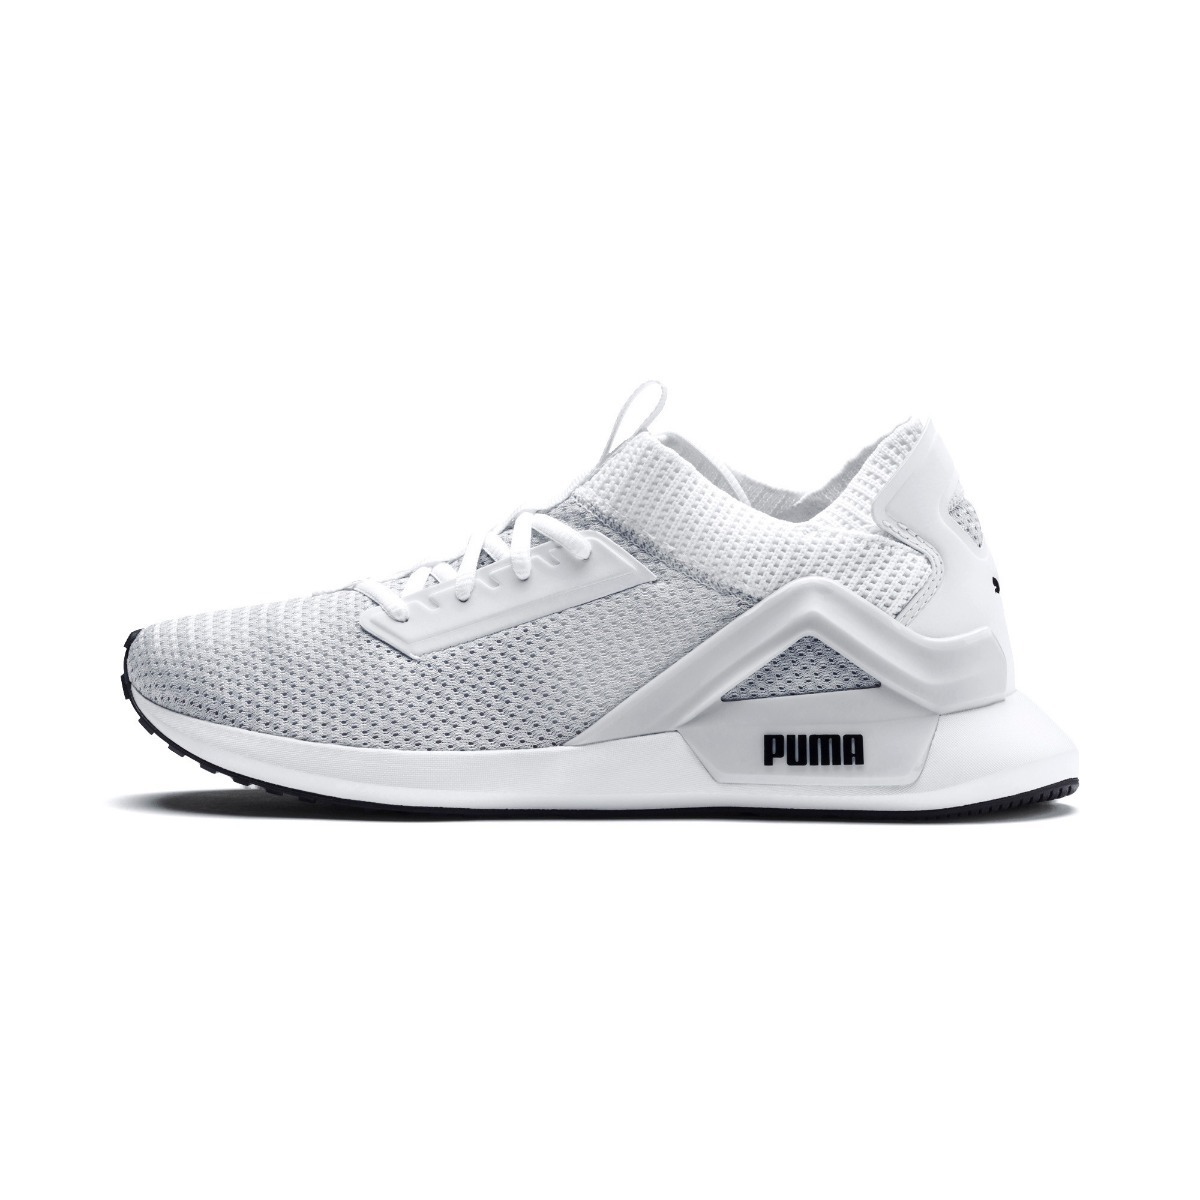 67662d5c32b tenis puma rogue blanco run correr hombre original a meses. Cargando zoom.